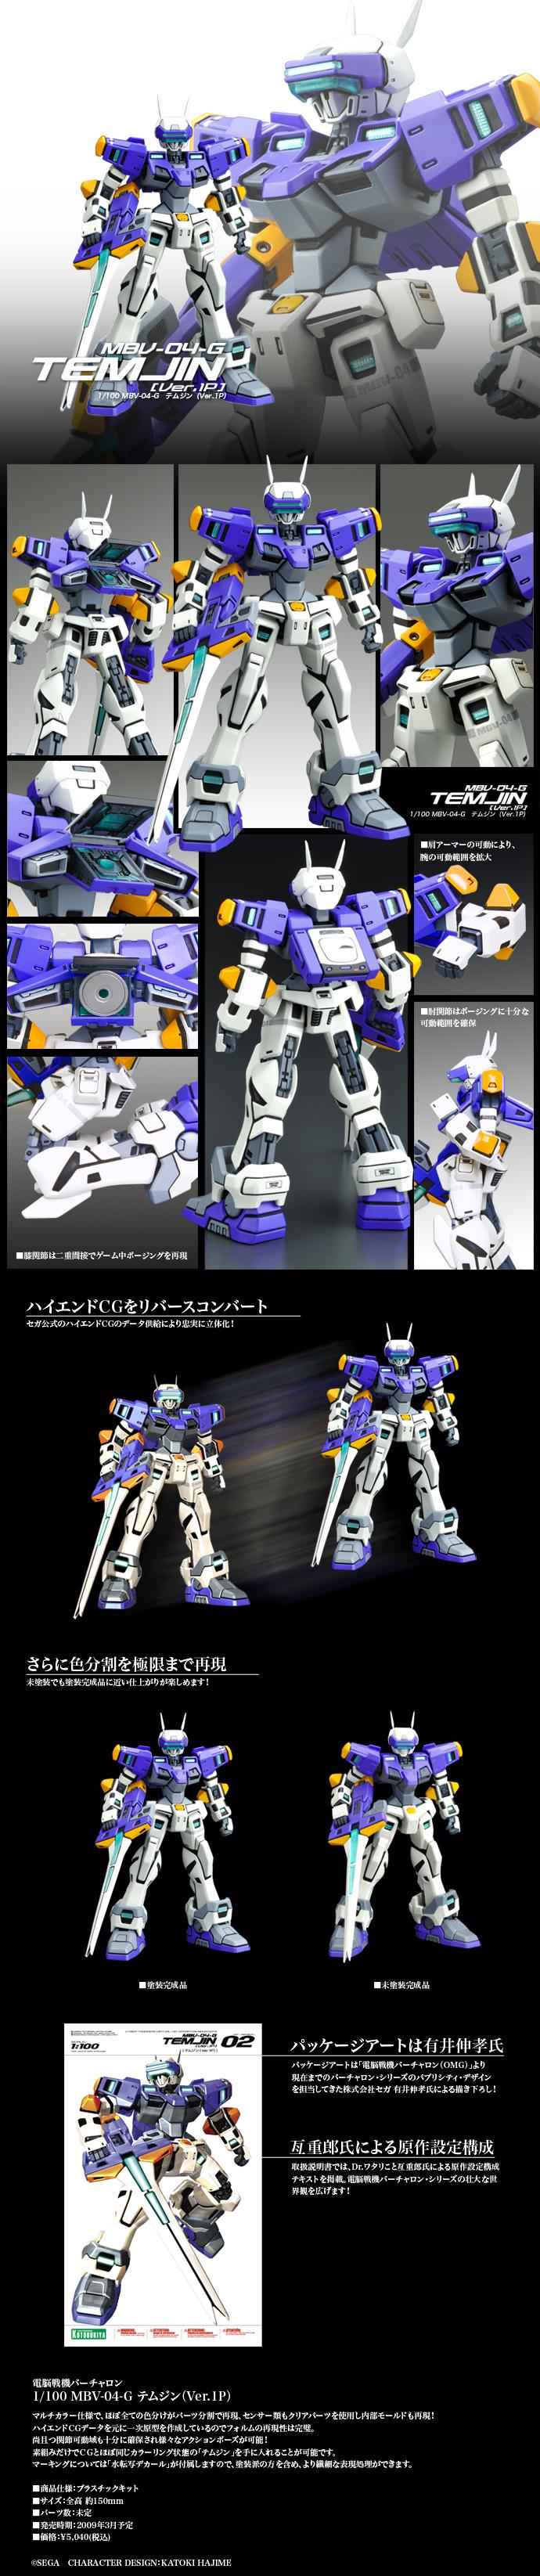 1/100 MBV-04-G テムジン(Ver.1P)